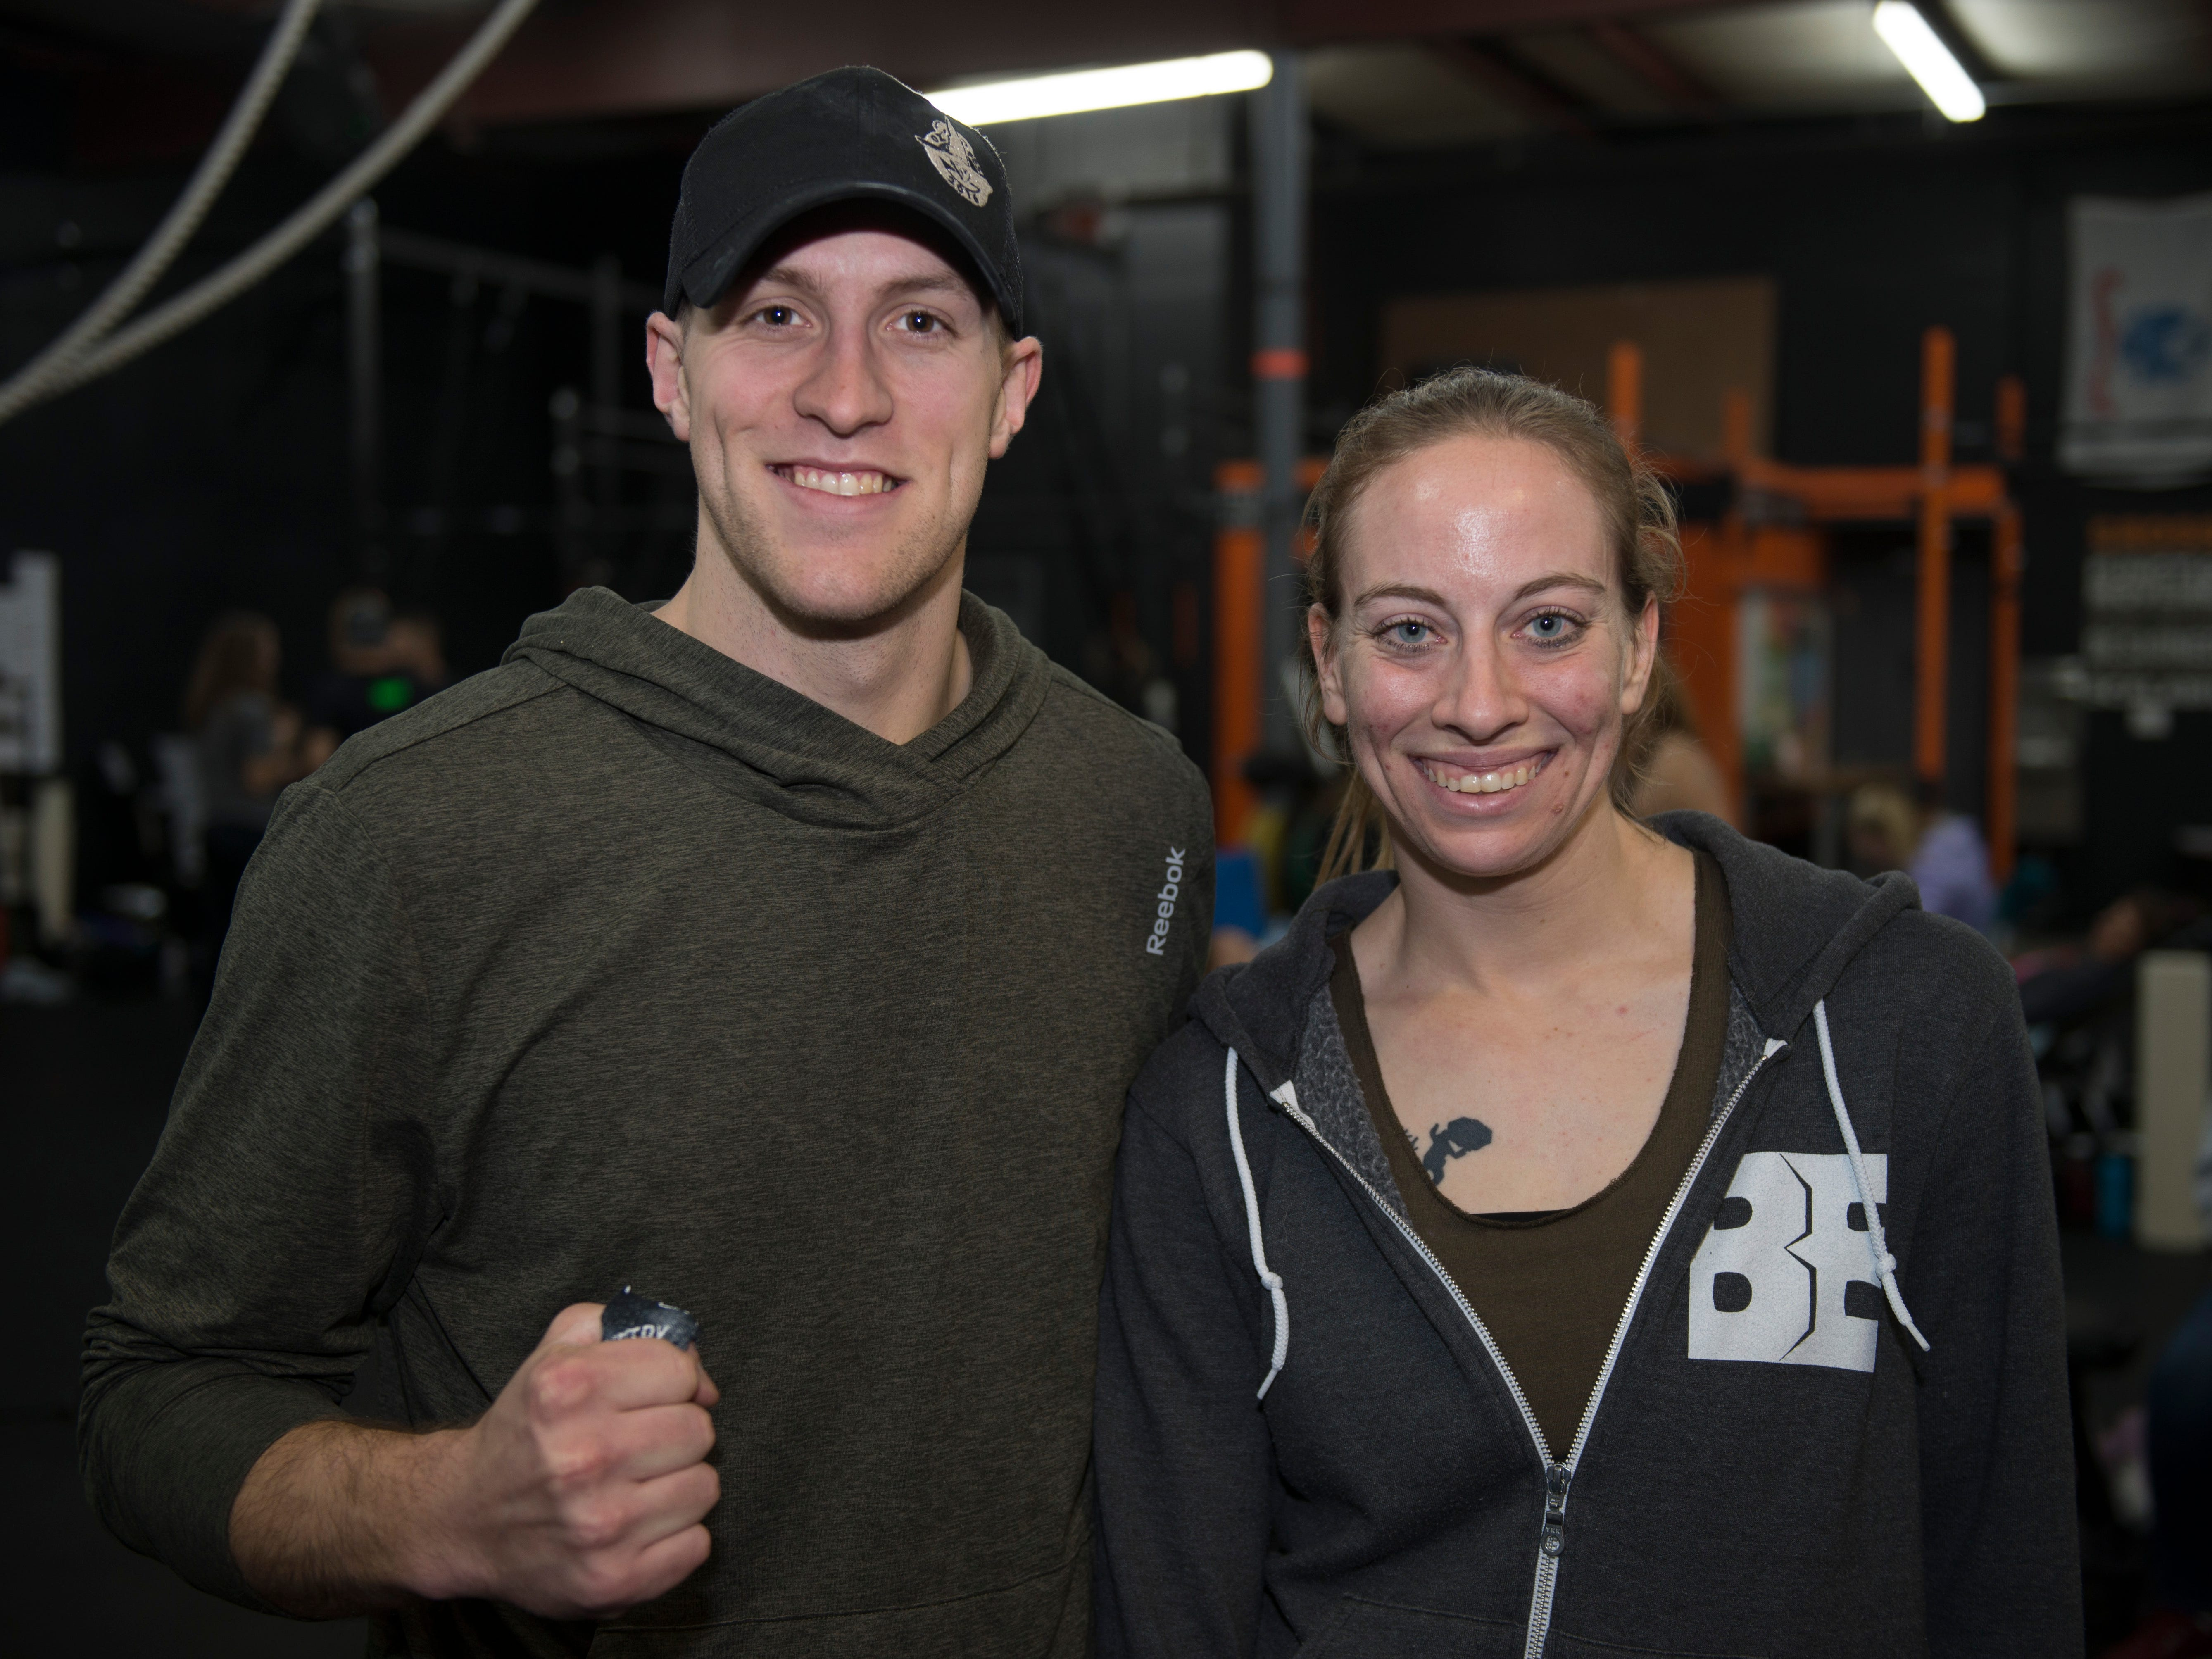 Kari Williams and Zane Schmeeckle